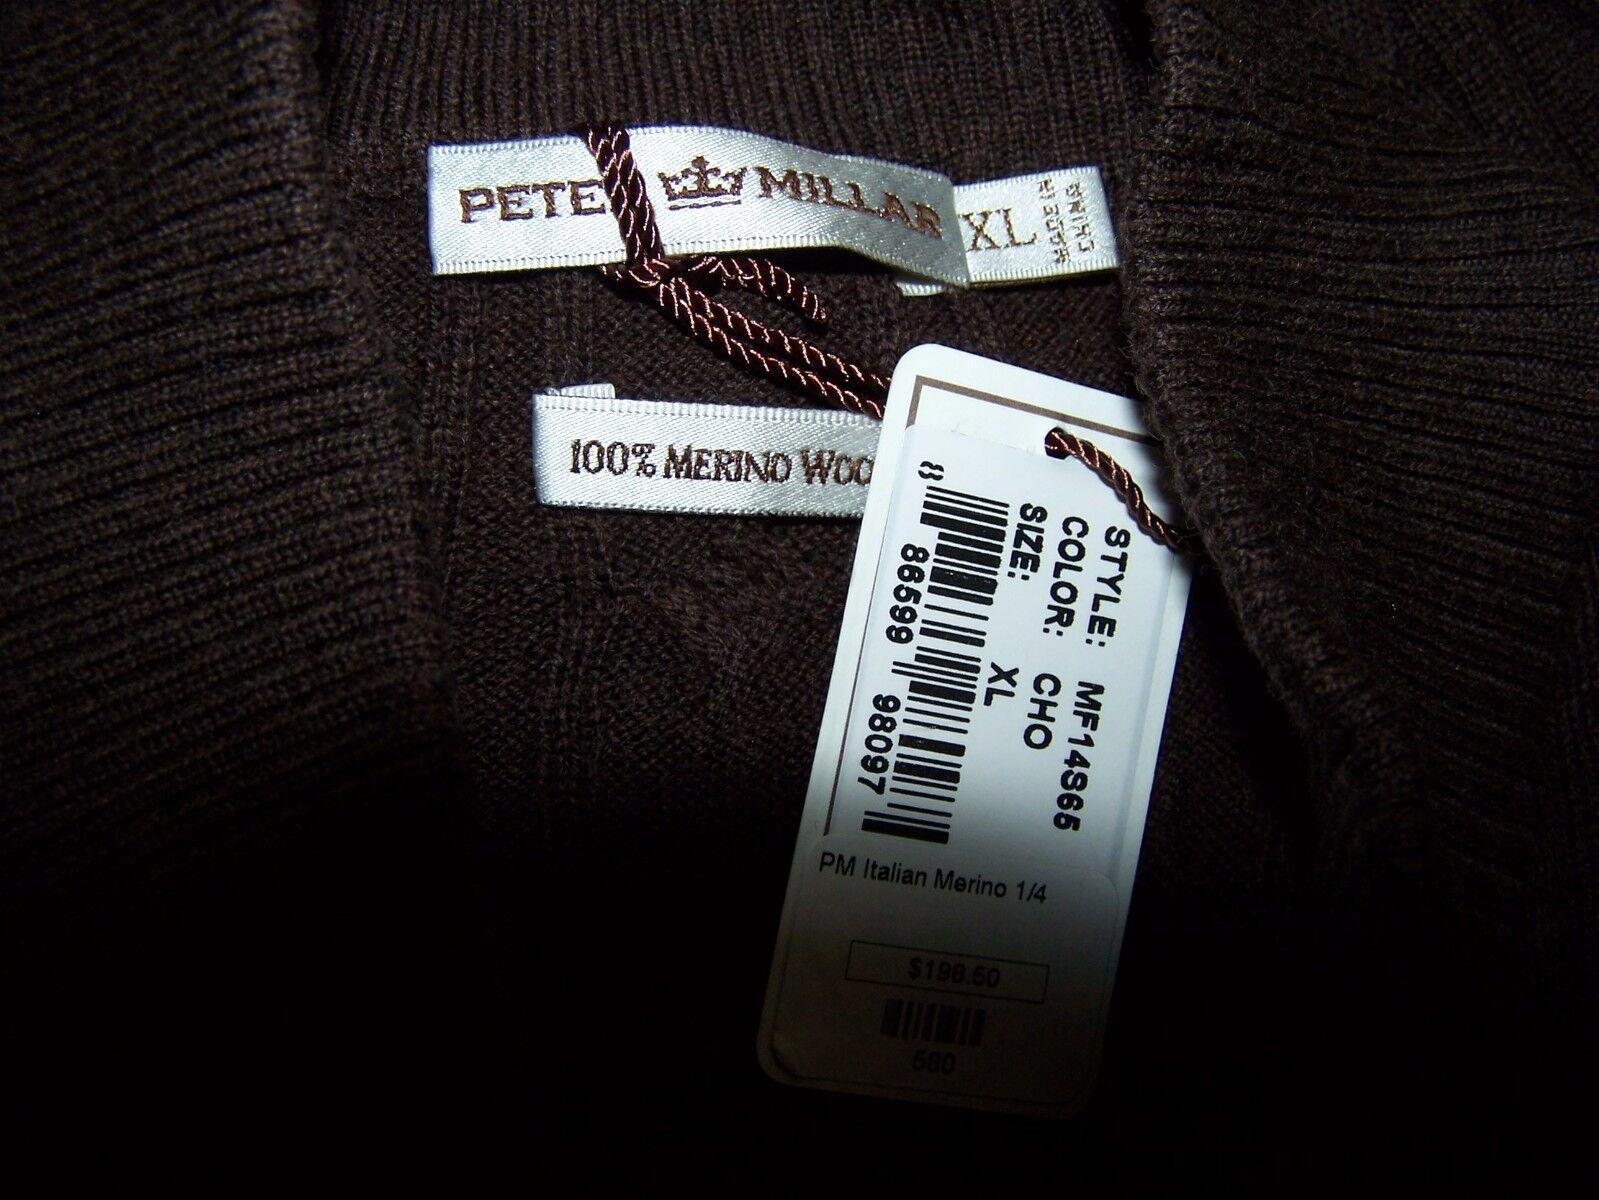 Peter Millar Millar Millar marrone 1/4 Button Sweater Merino Lana Uomo's XL NWT 53b646